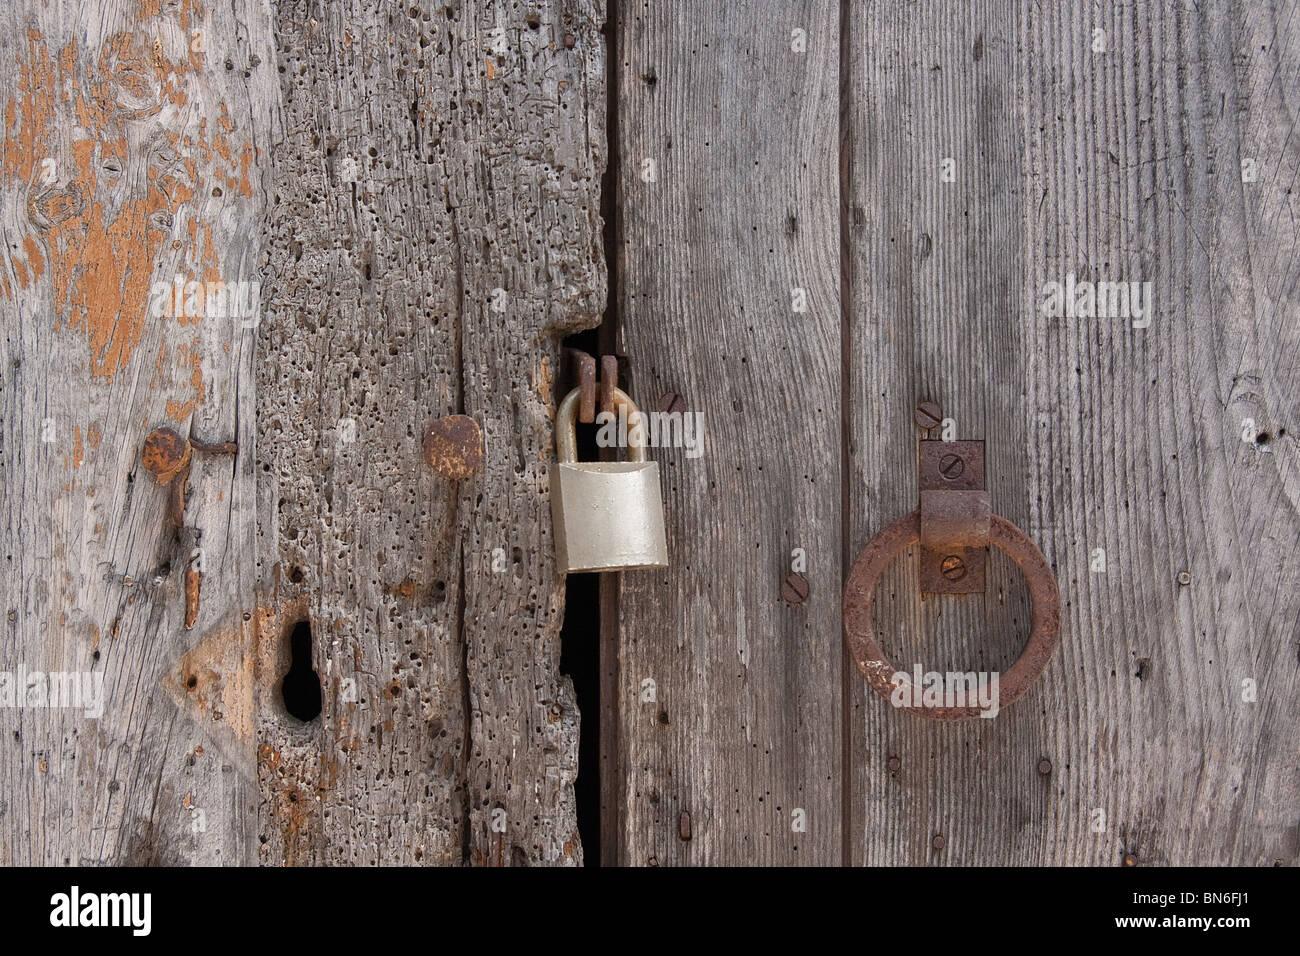 Locked immagini locked fotos stock alamy for Vecchie tavole legno